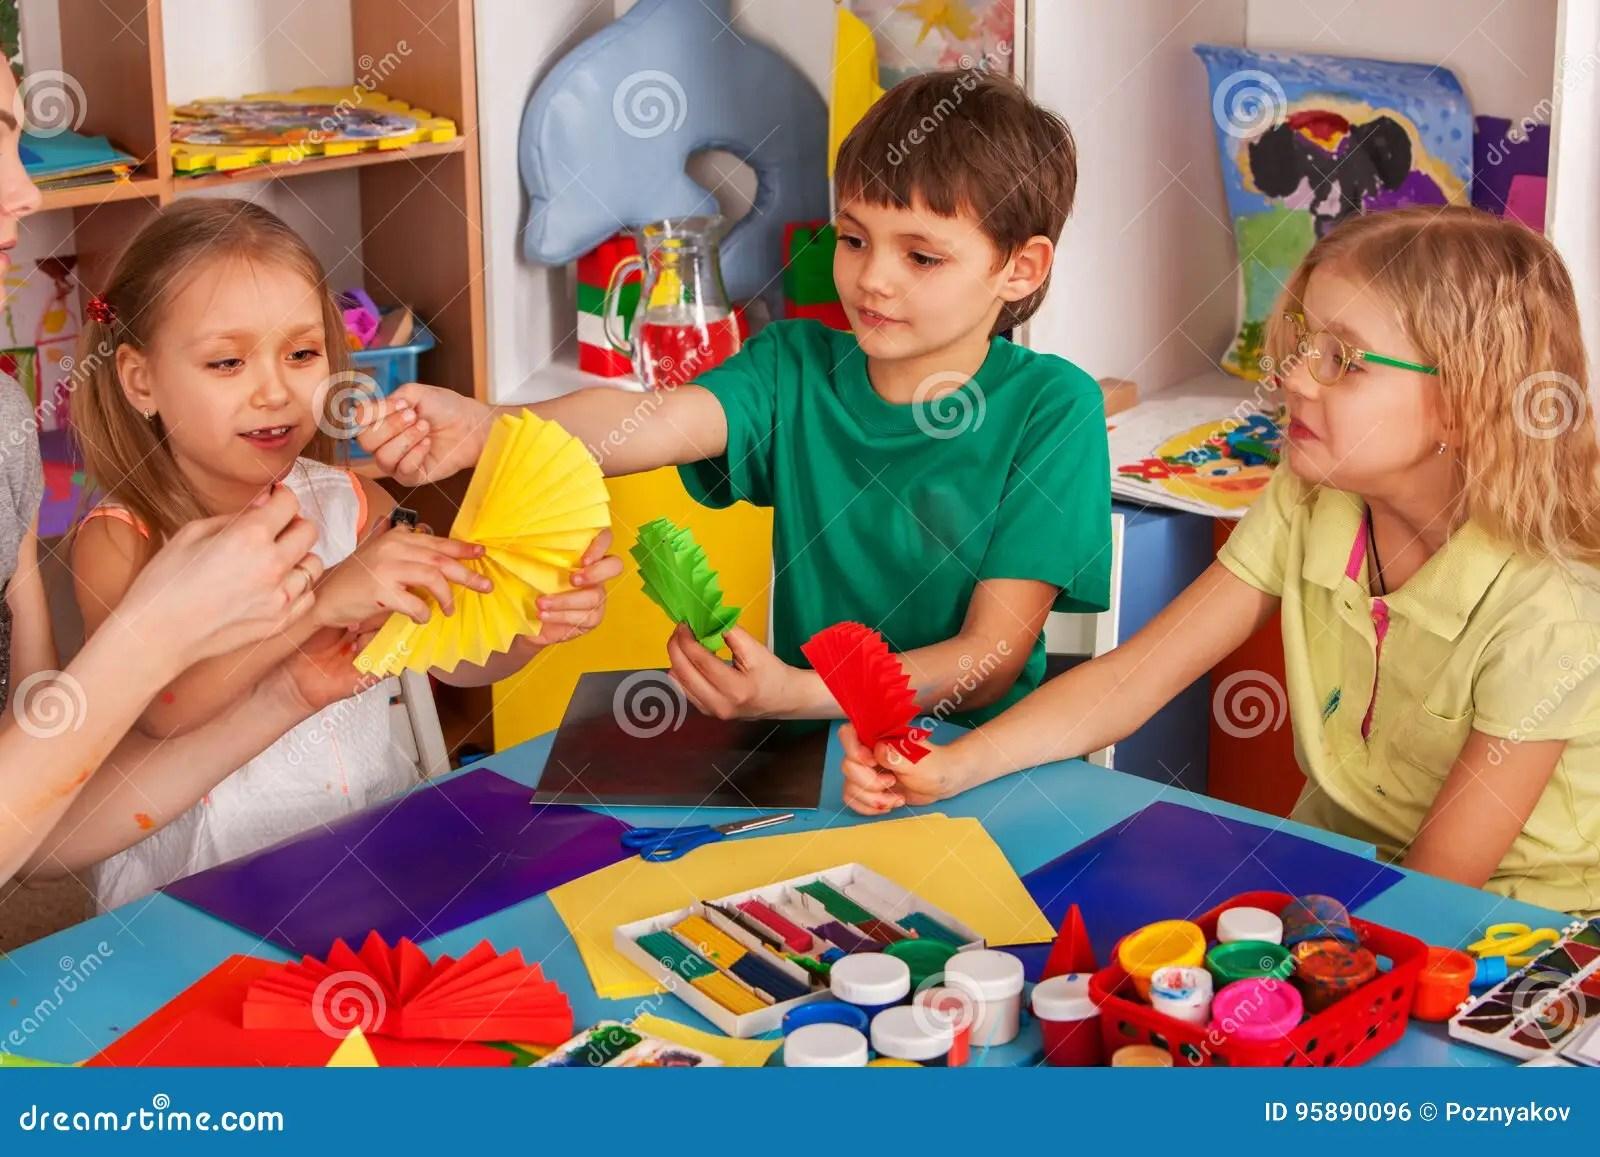 School Children With Scissors In Kids Hands Cutting Paper